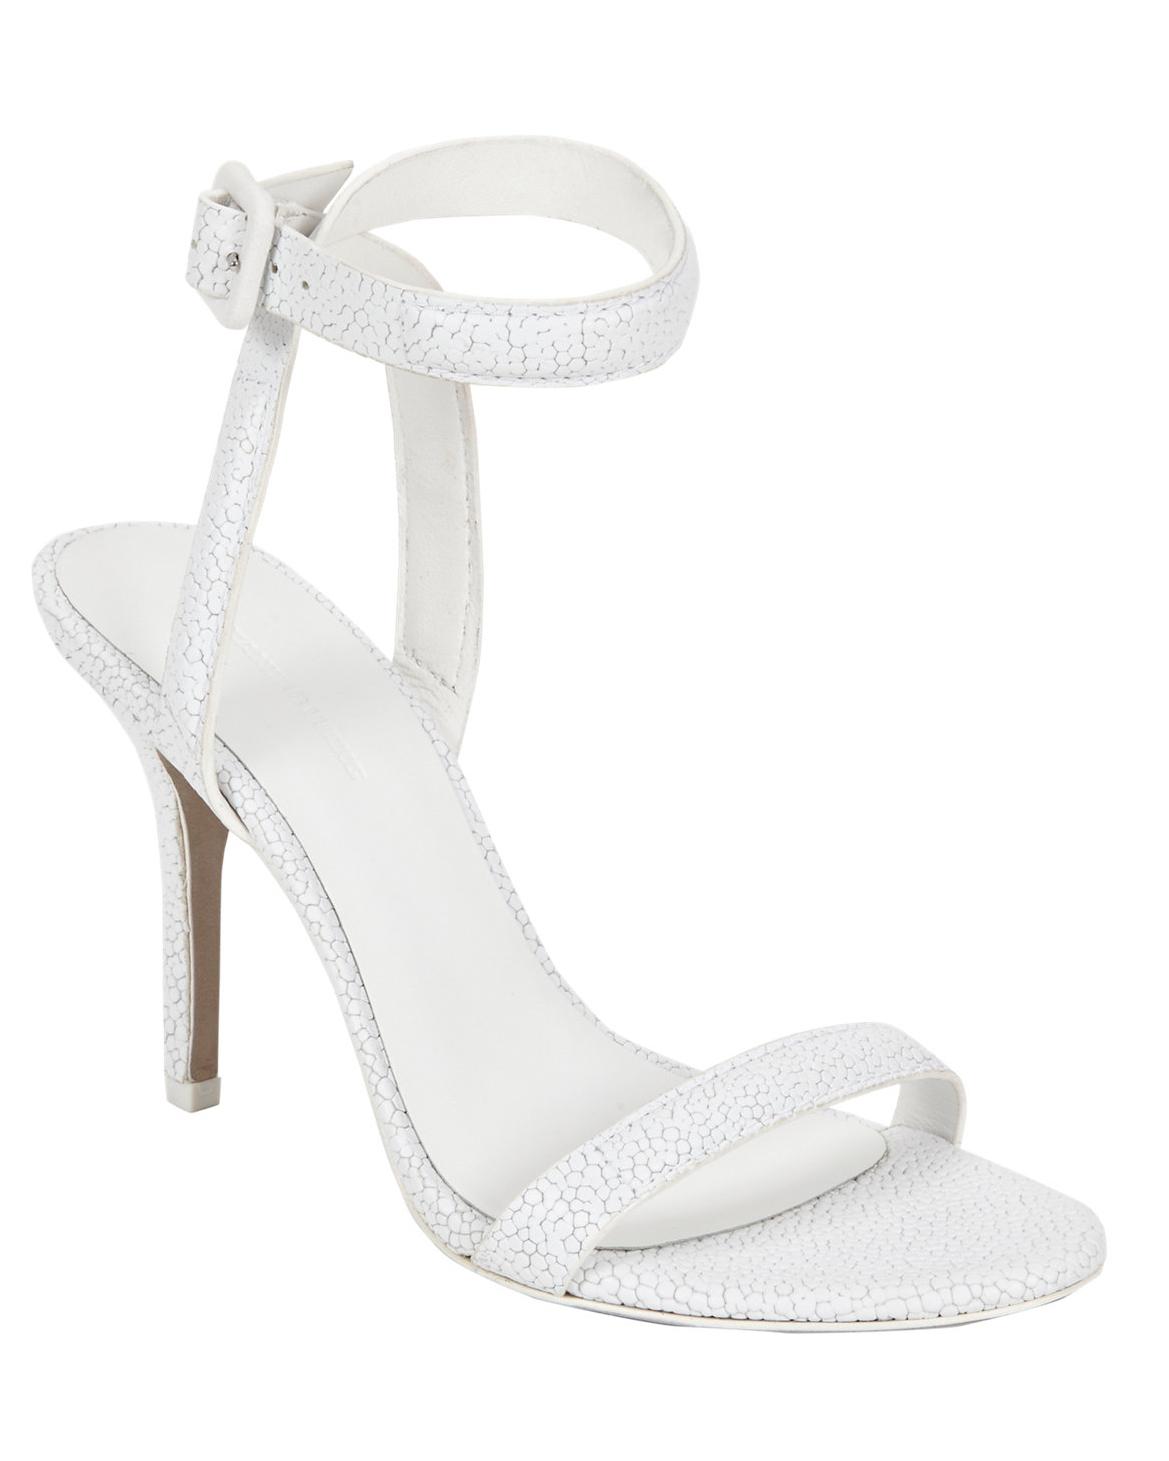 fall-wedding-shoes-alexander-wang-antonia-0914.jpg